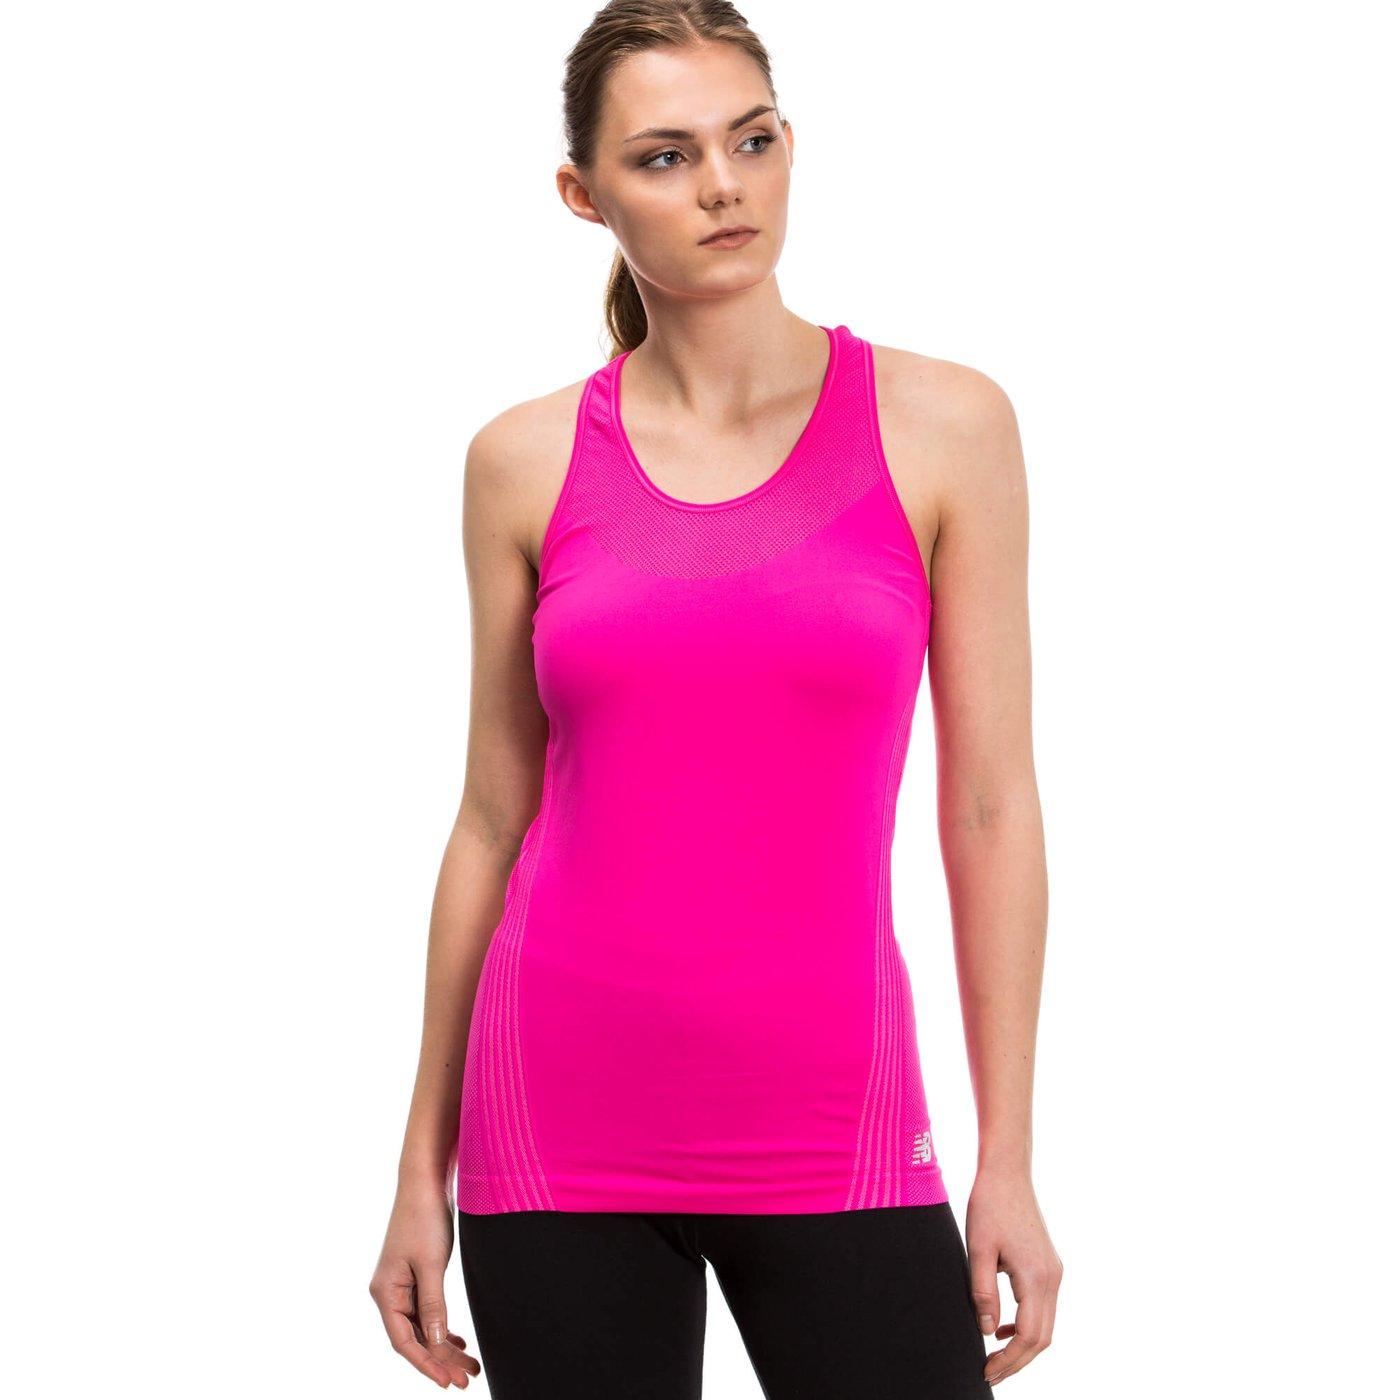 New Balance Kadın Pembe Atlet